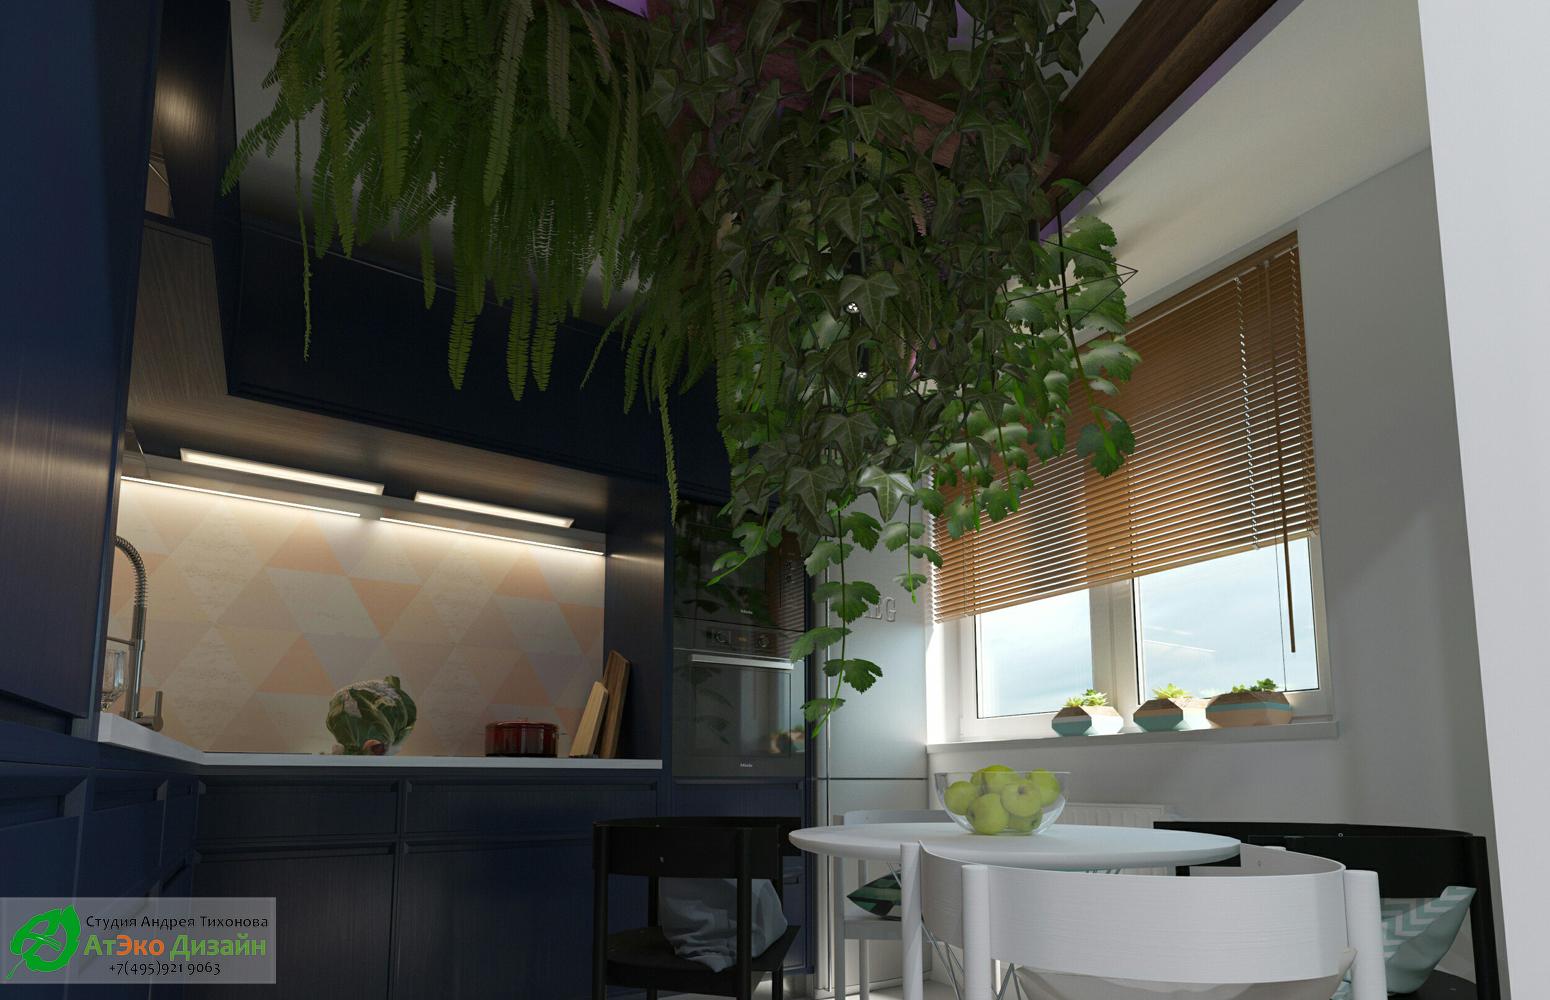 Дизайн кухни в стиле Эклектика дизайн проект